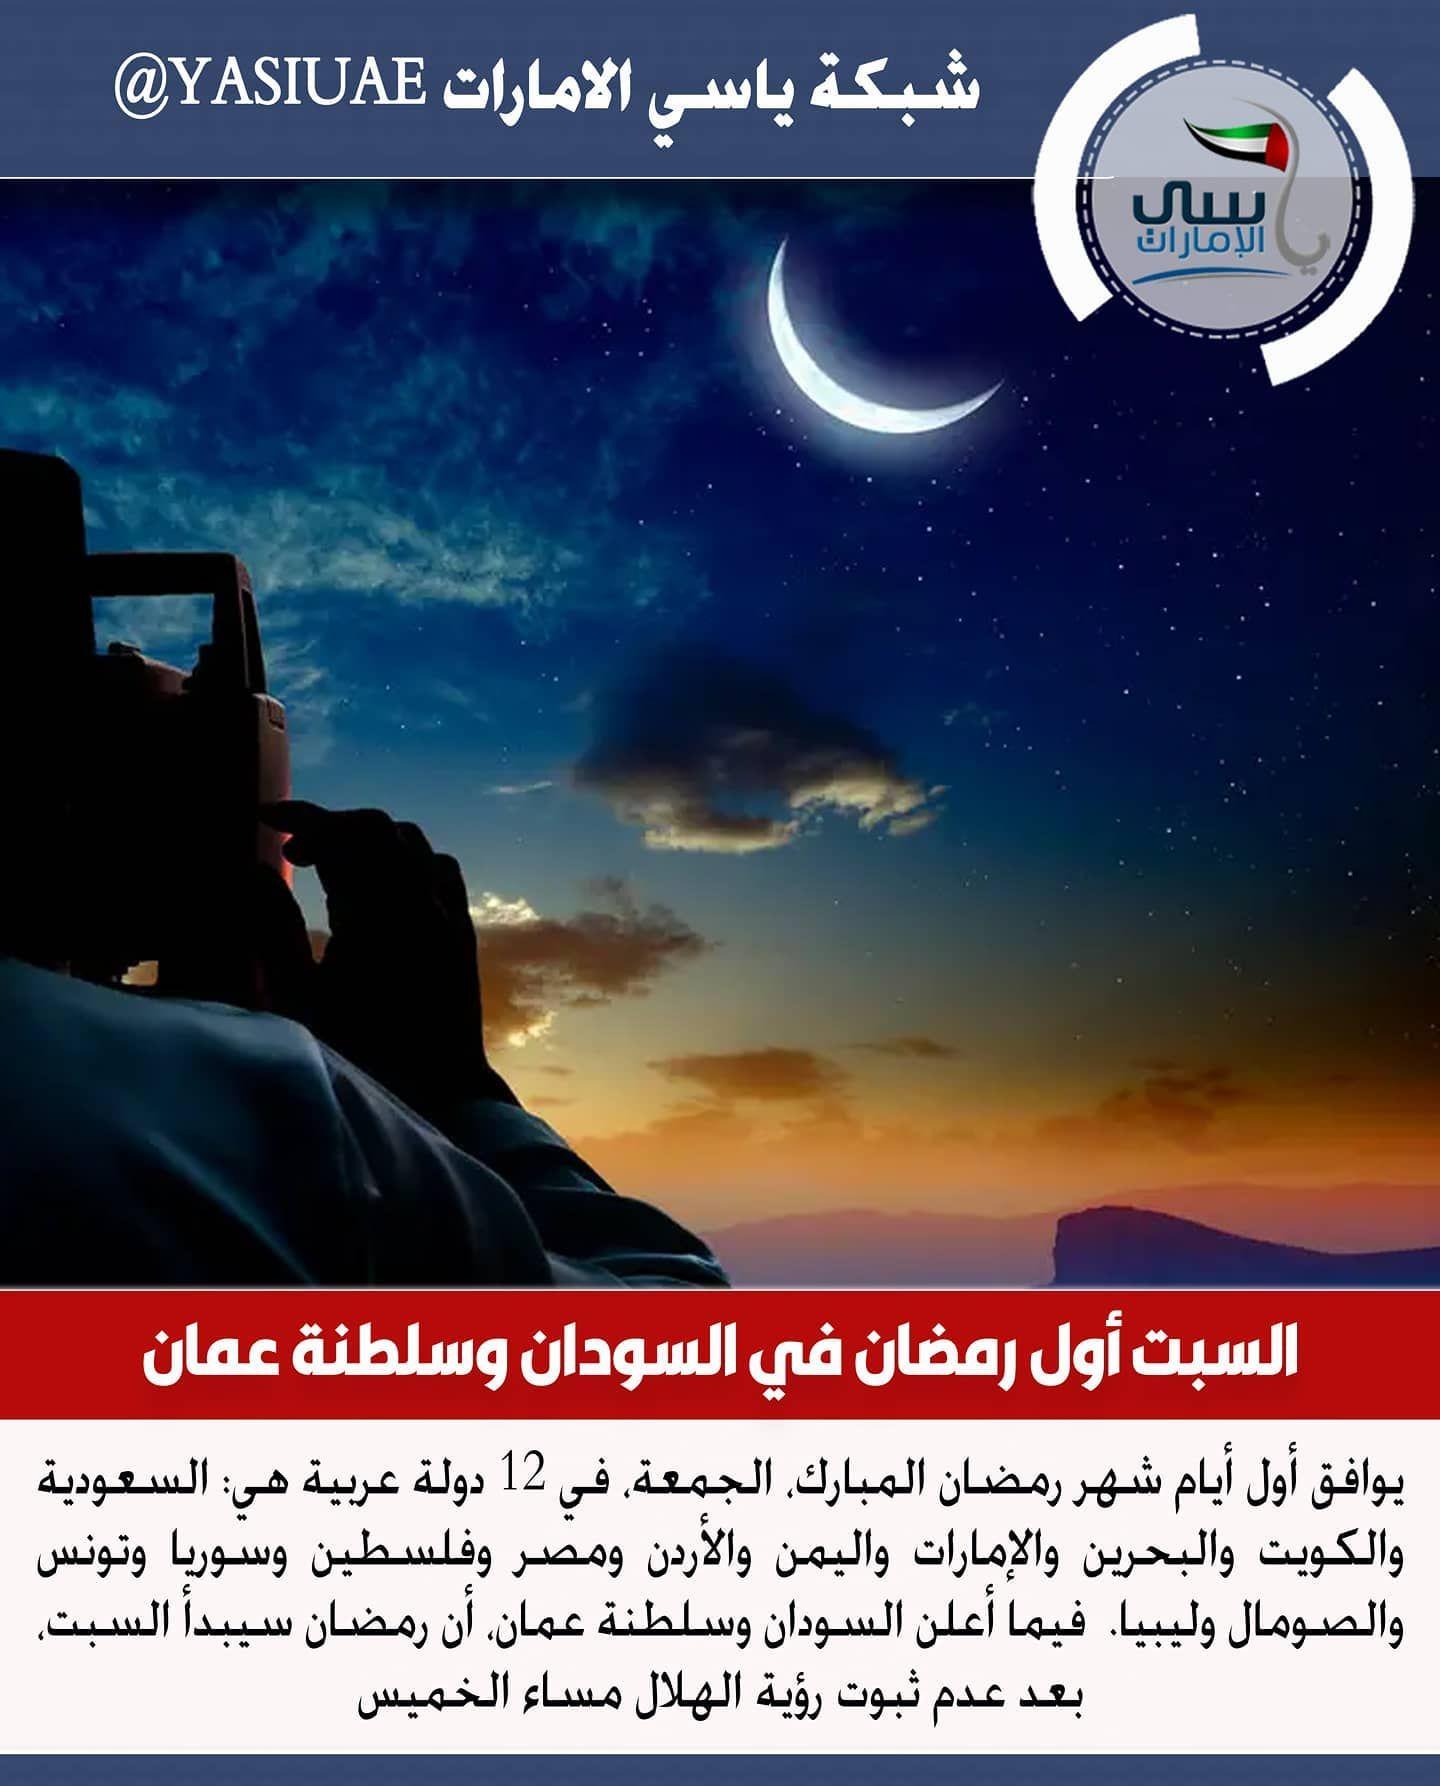 السبت أول رمضان في السودان وسلطنة عمان Www Yasiuae Net Movie Posters Pandora Screenshot Poster